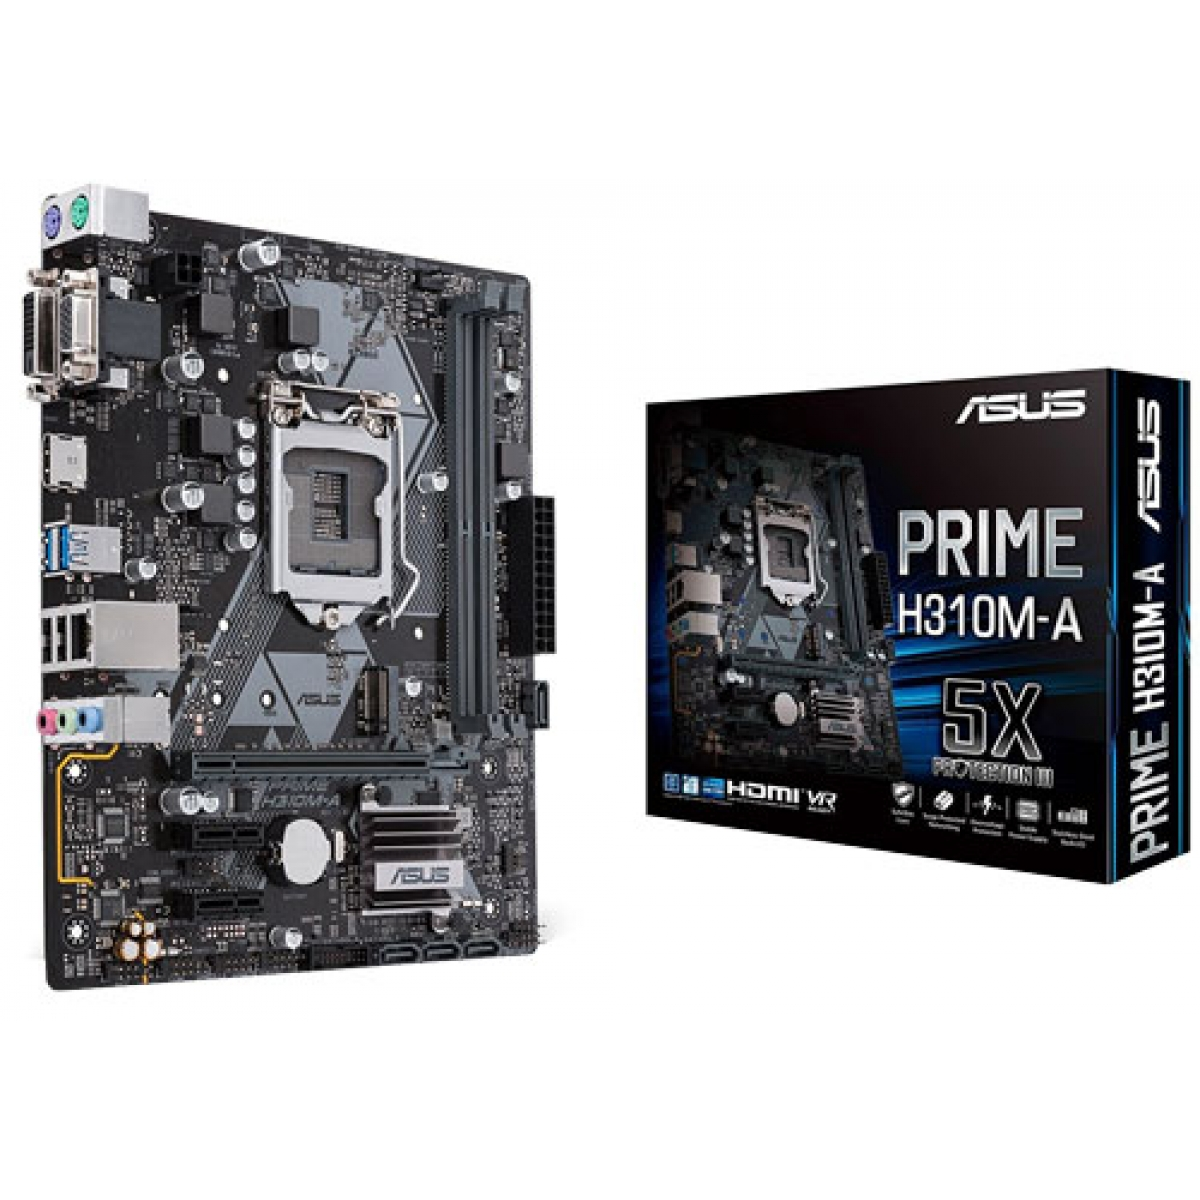 Placa Mãe Asus Prime H310M-A, Chipset H310, Intel LGA 1151, mATX, DDR4